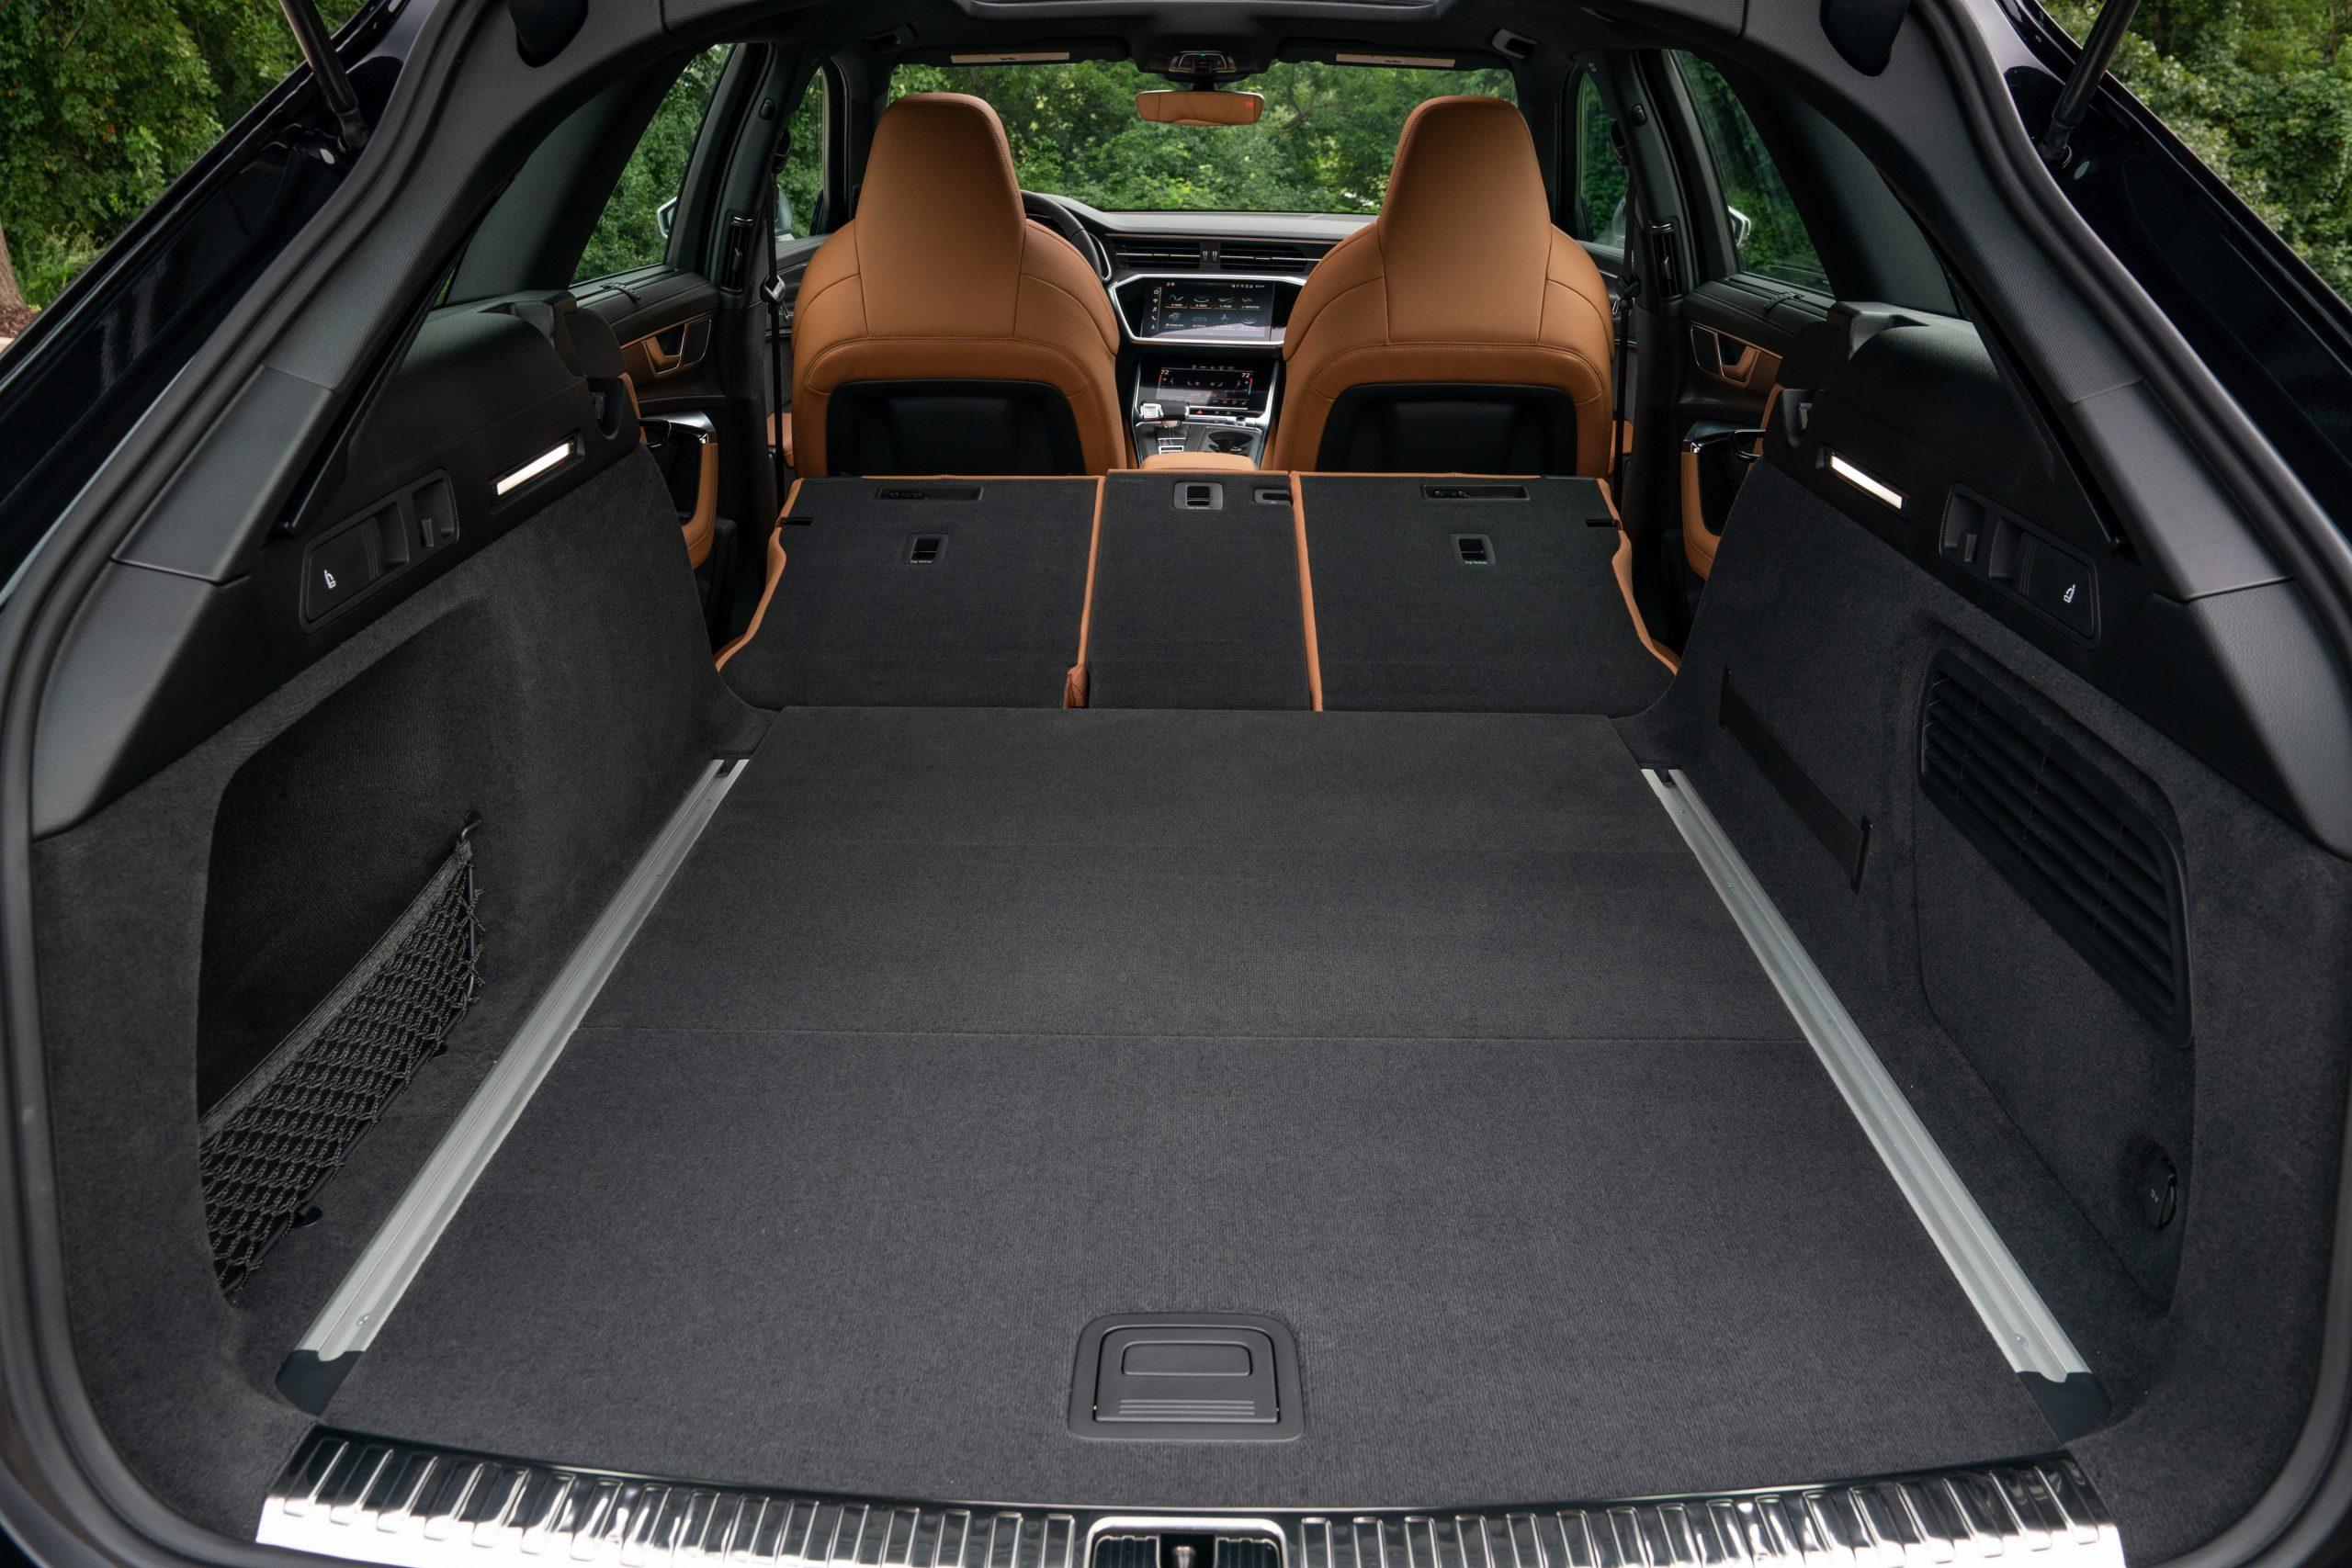 RS 6 Avant Nardo Gray interior rear cargo room area seats down